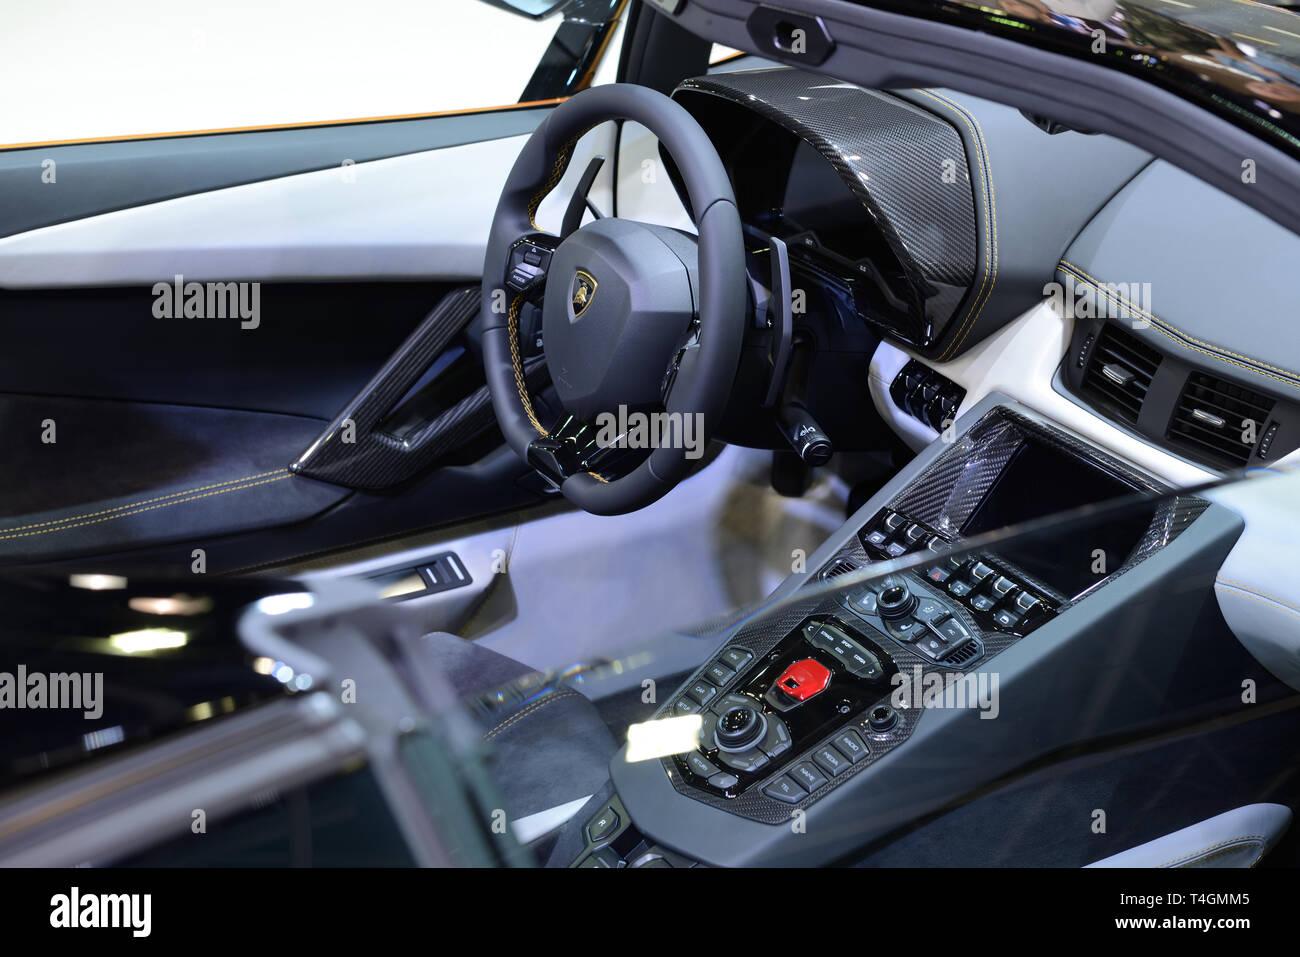 Dubai Uae November 17 The Interior Of Lamborghini Aventador S